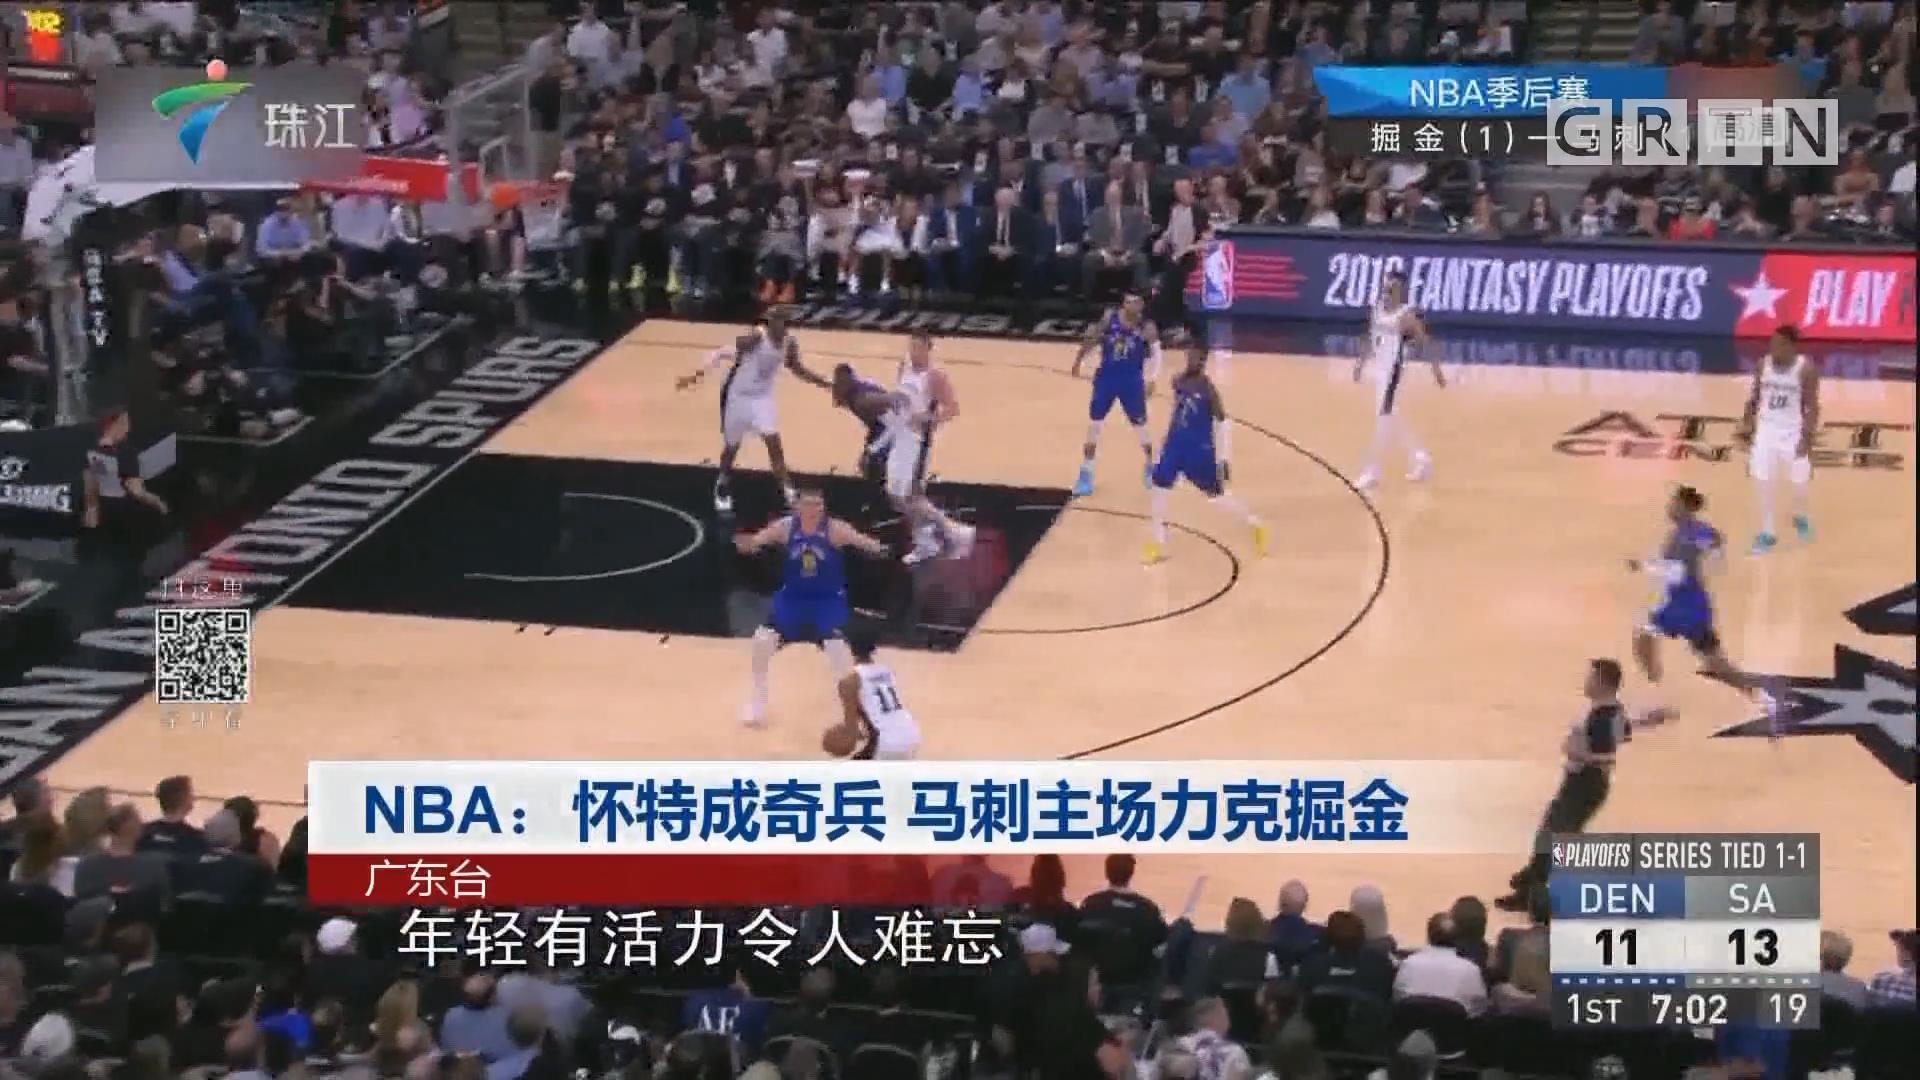 NBA:怀特成奇兵 马刺主场力克掘金